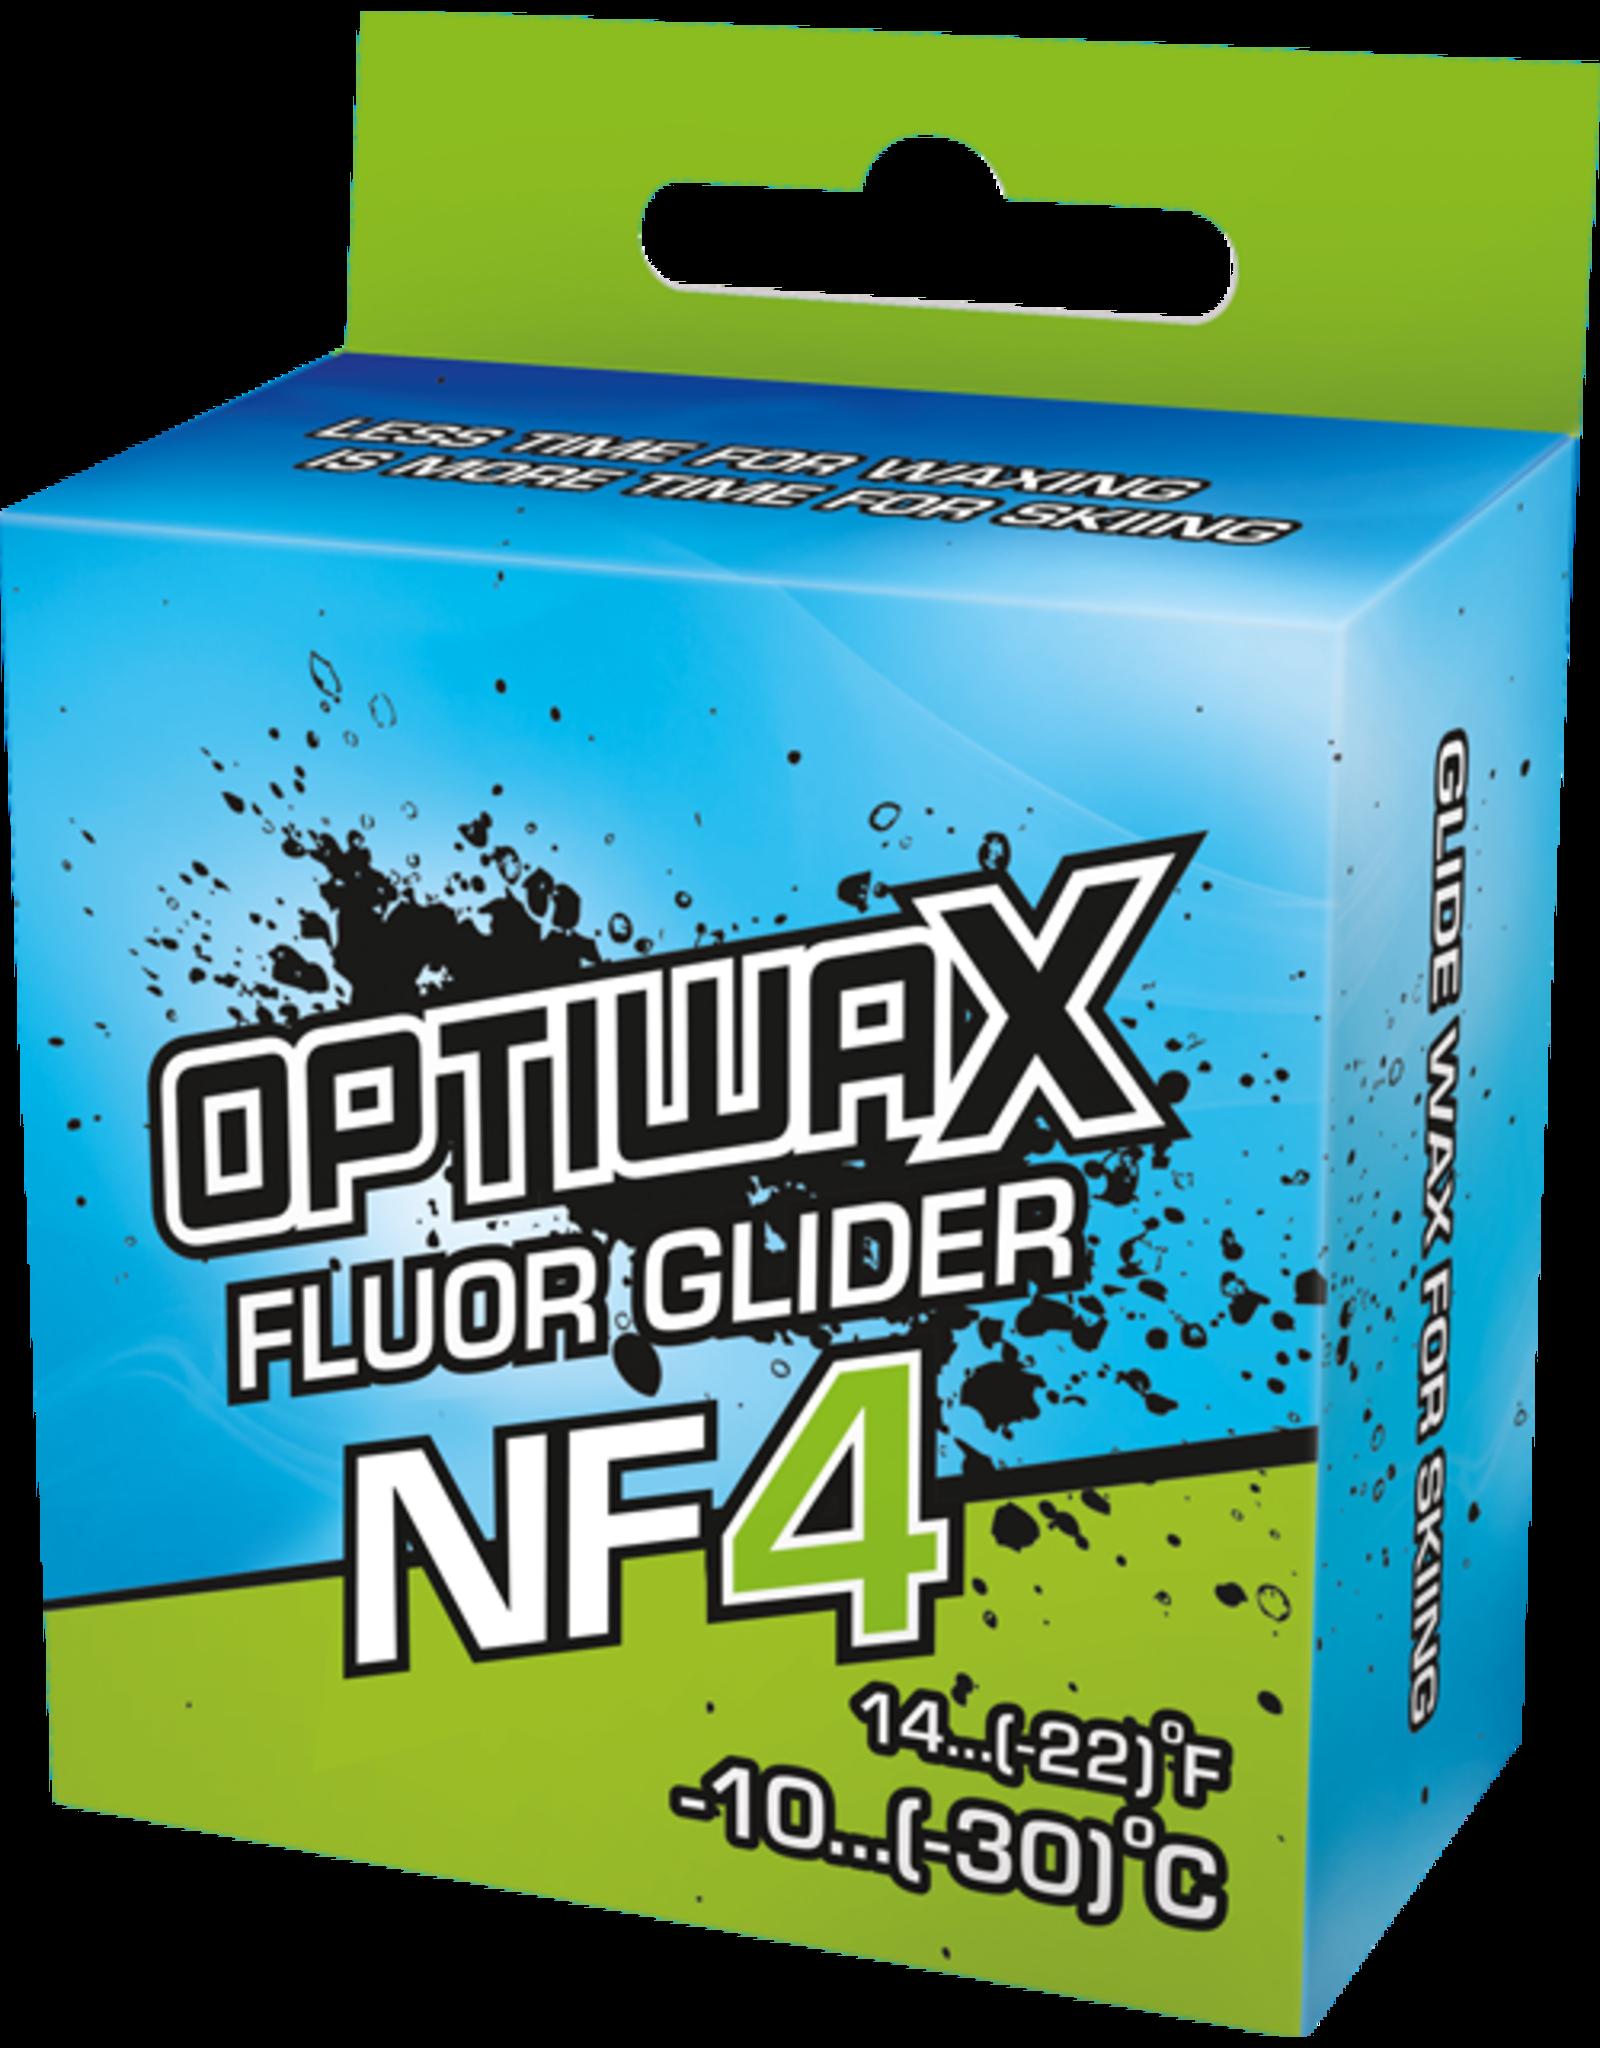 Optiwax Optiwax Glide NF4 Green